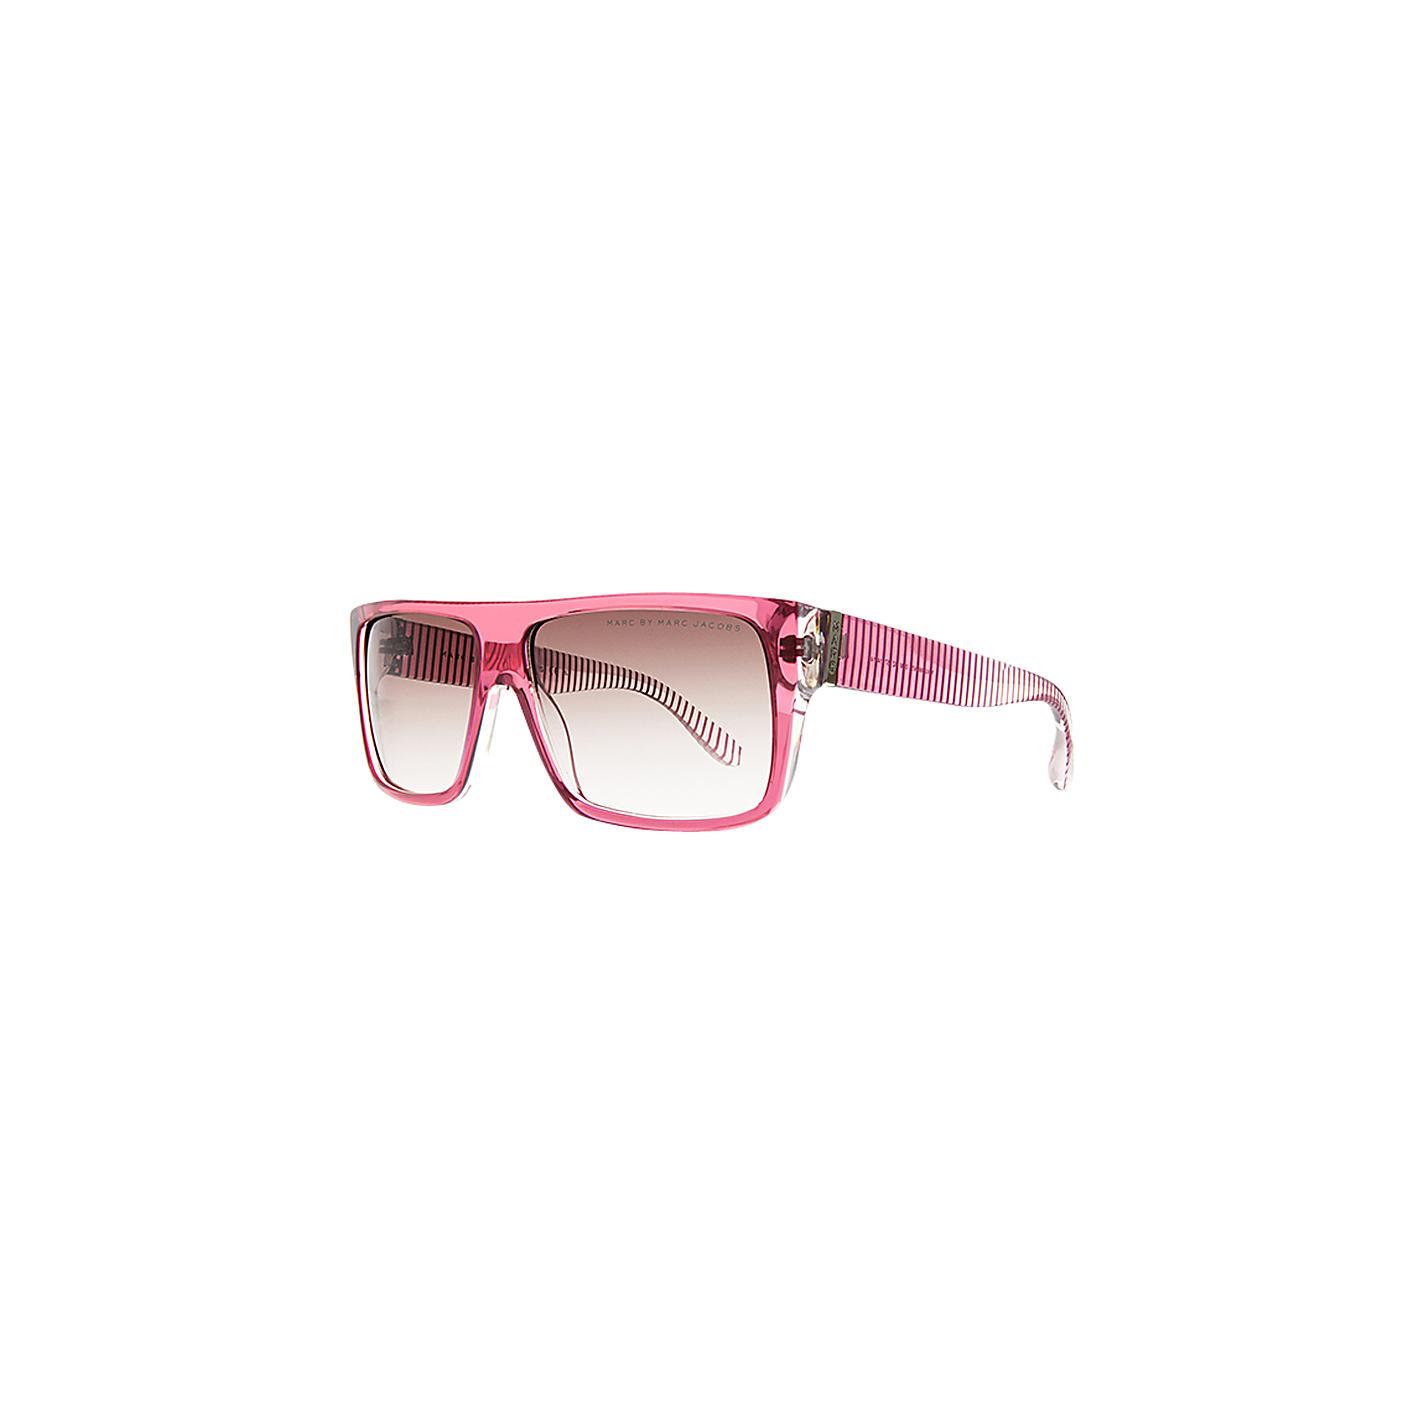 Transparent Sunglasses Online Transparent Sunglasses